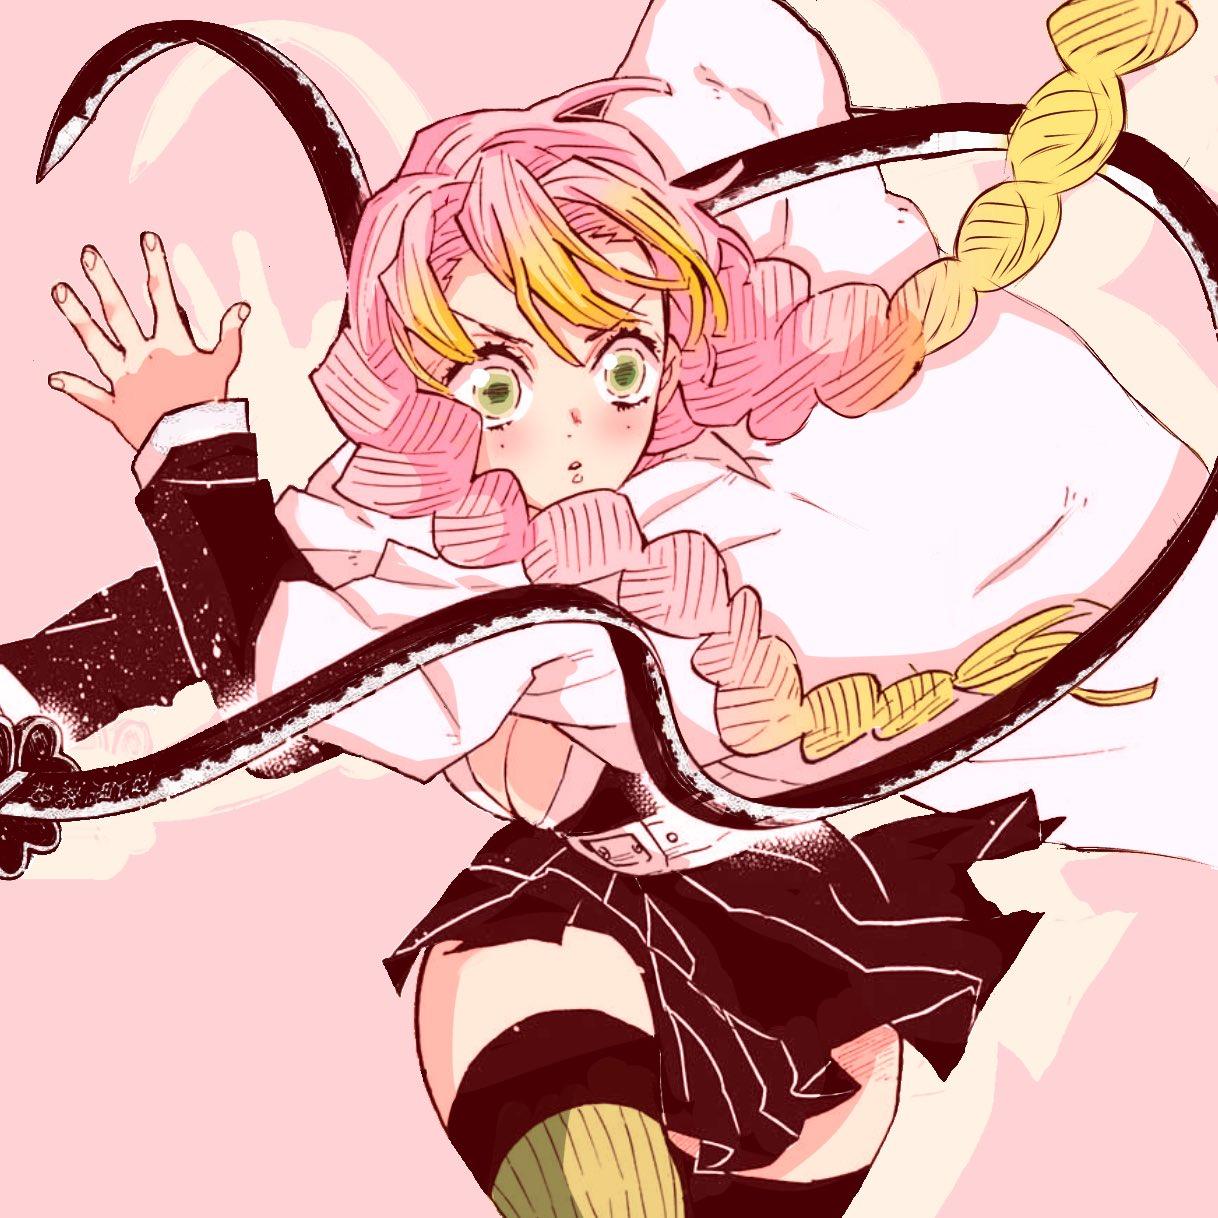 Moved Accounts On Twitter Mitsuri Colored Manga Panels Demonslayer Kimestunoyaiba Kny Mitsurikanroji #cosplaygirl #cosplayer #kanrojimitsuri #mitsurikanroji #mitsurikanrojicosplay #demonslayer #demonslayercosplay #demonslayeranime #anime #animegirl #animelife #fotosession #sweet #sweetgirl #косплей #dolligirl #cutecosplay #cosplaylicious. mitsuri colored manga panels